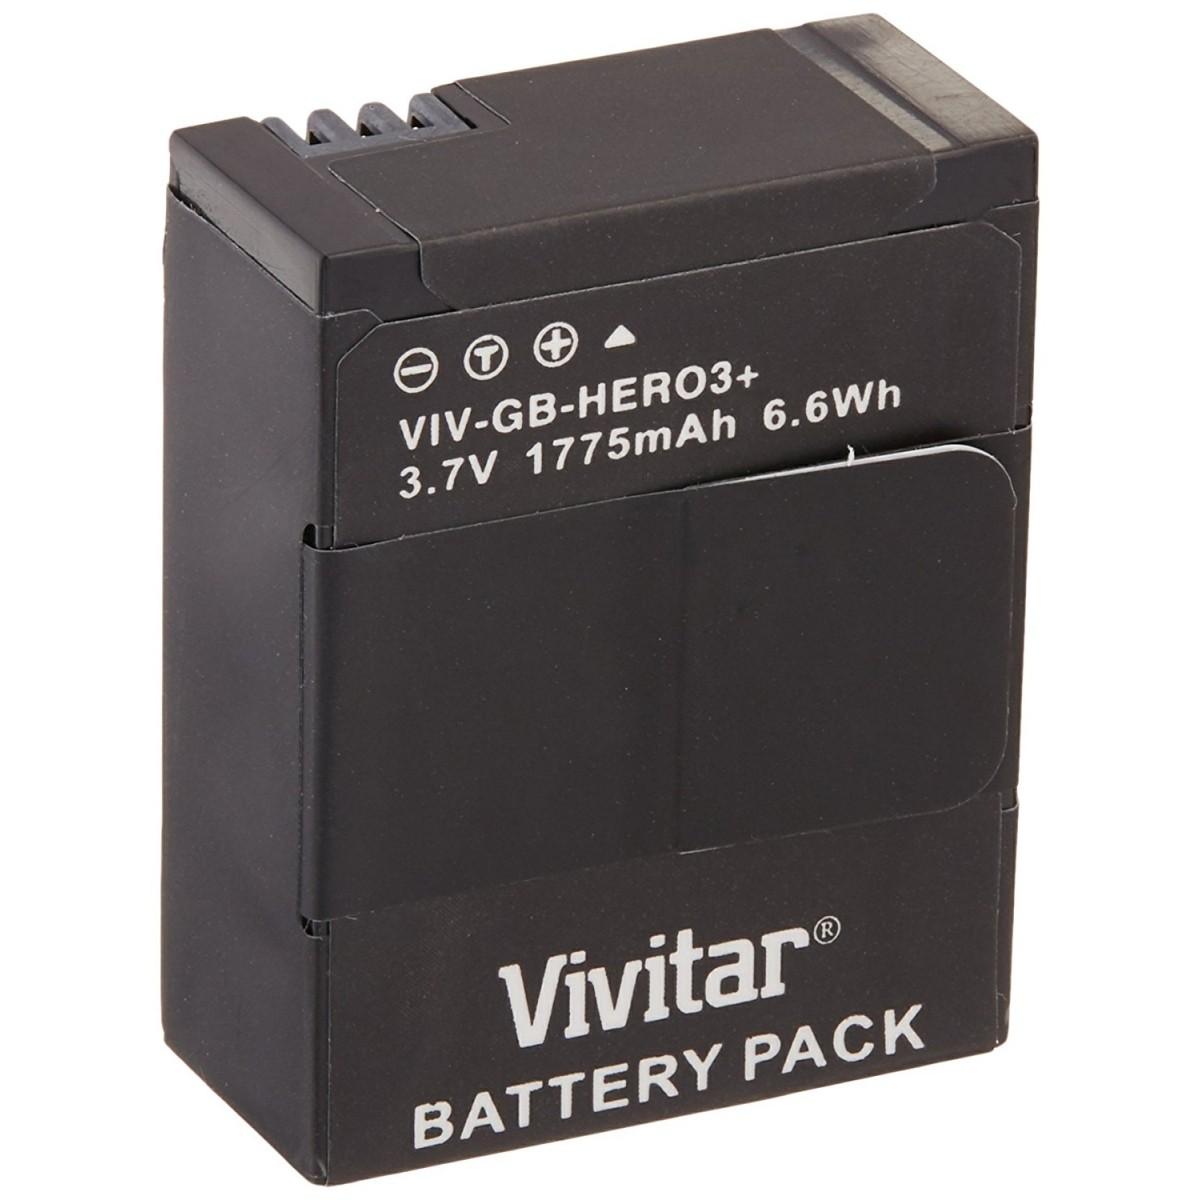 Bateria Recarregável Vivitar Compativel Com GoPro - AHDBT-301/AHDBT-302 - VIV-GBHERO3